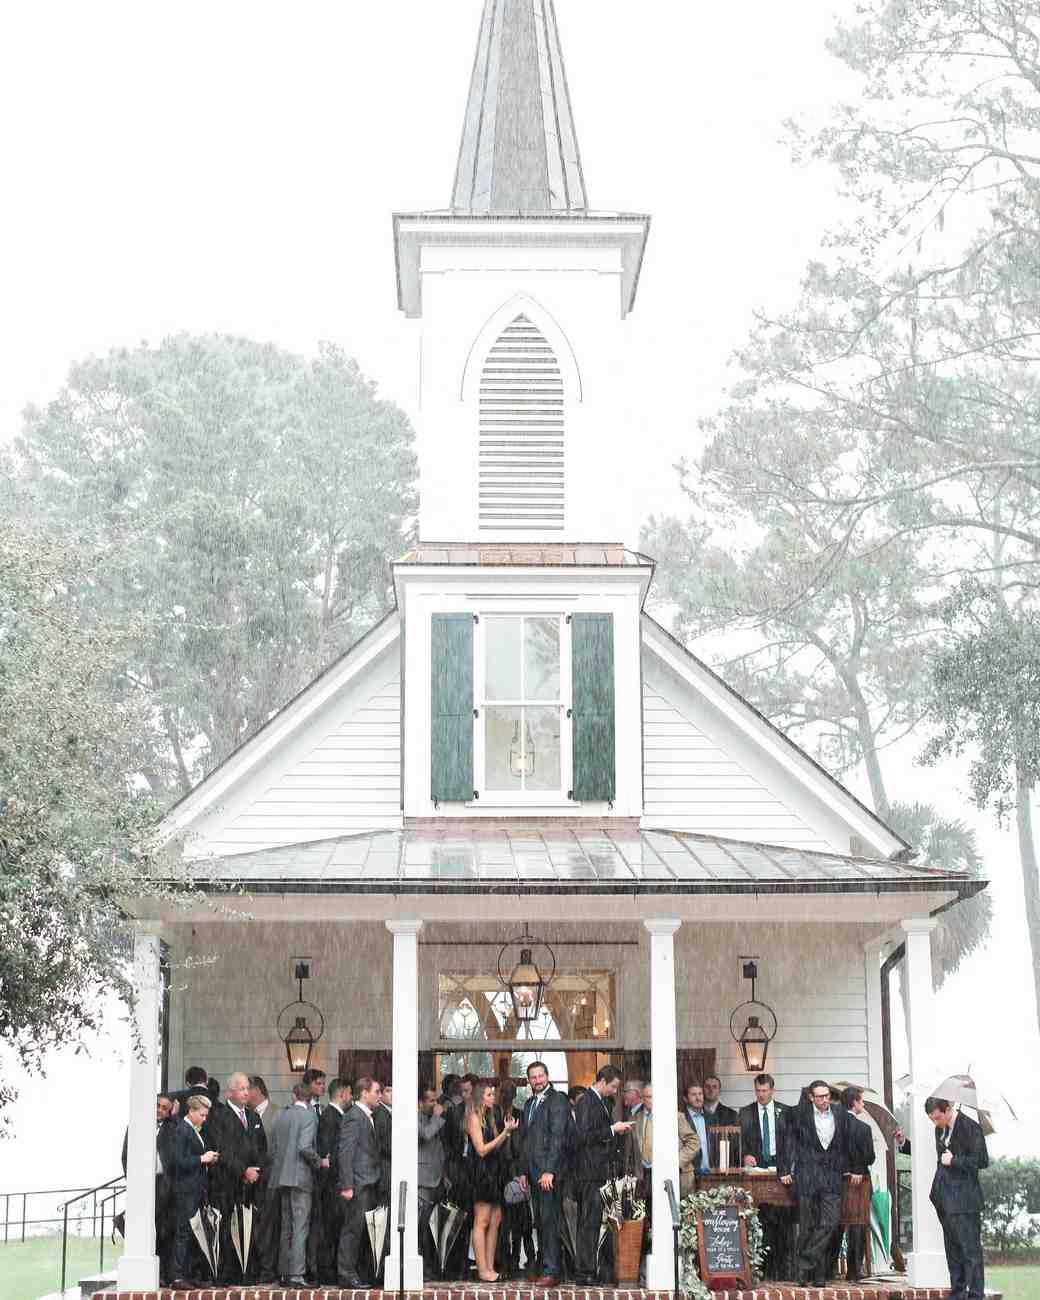 taylor-john-wedding-rain-church-8-s113035-0616.jpg